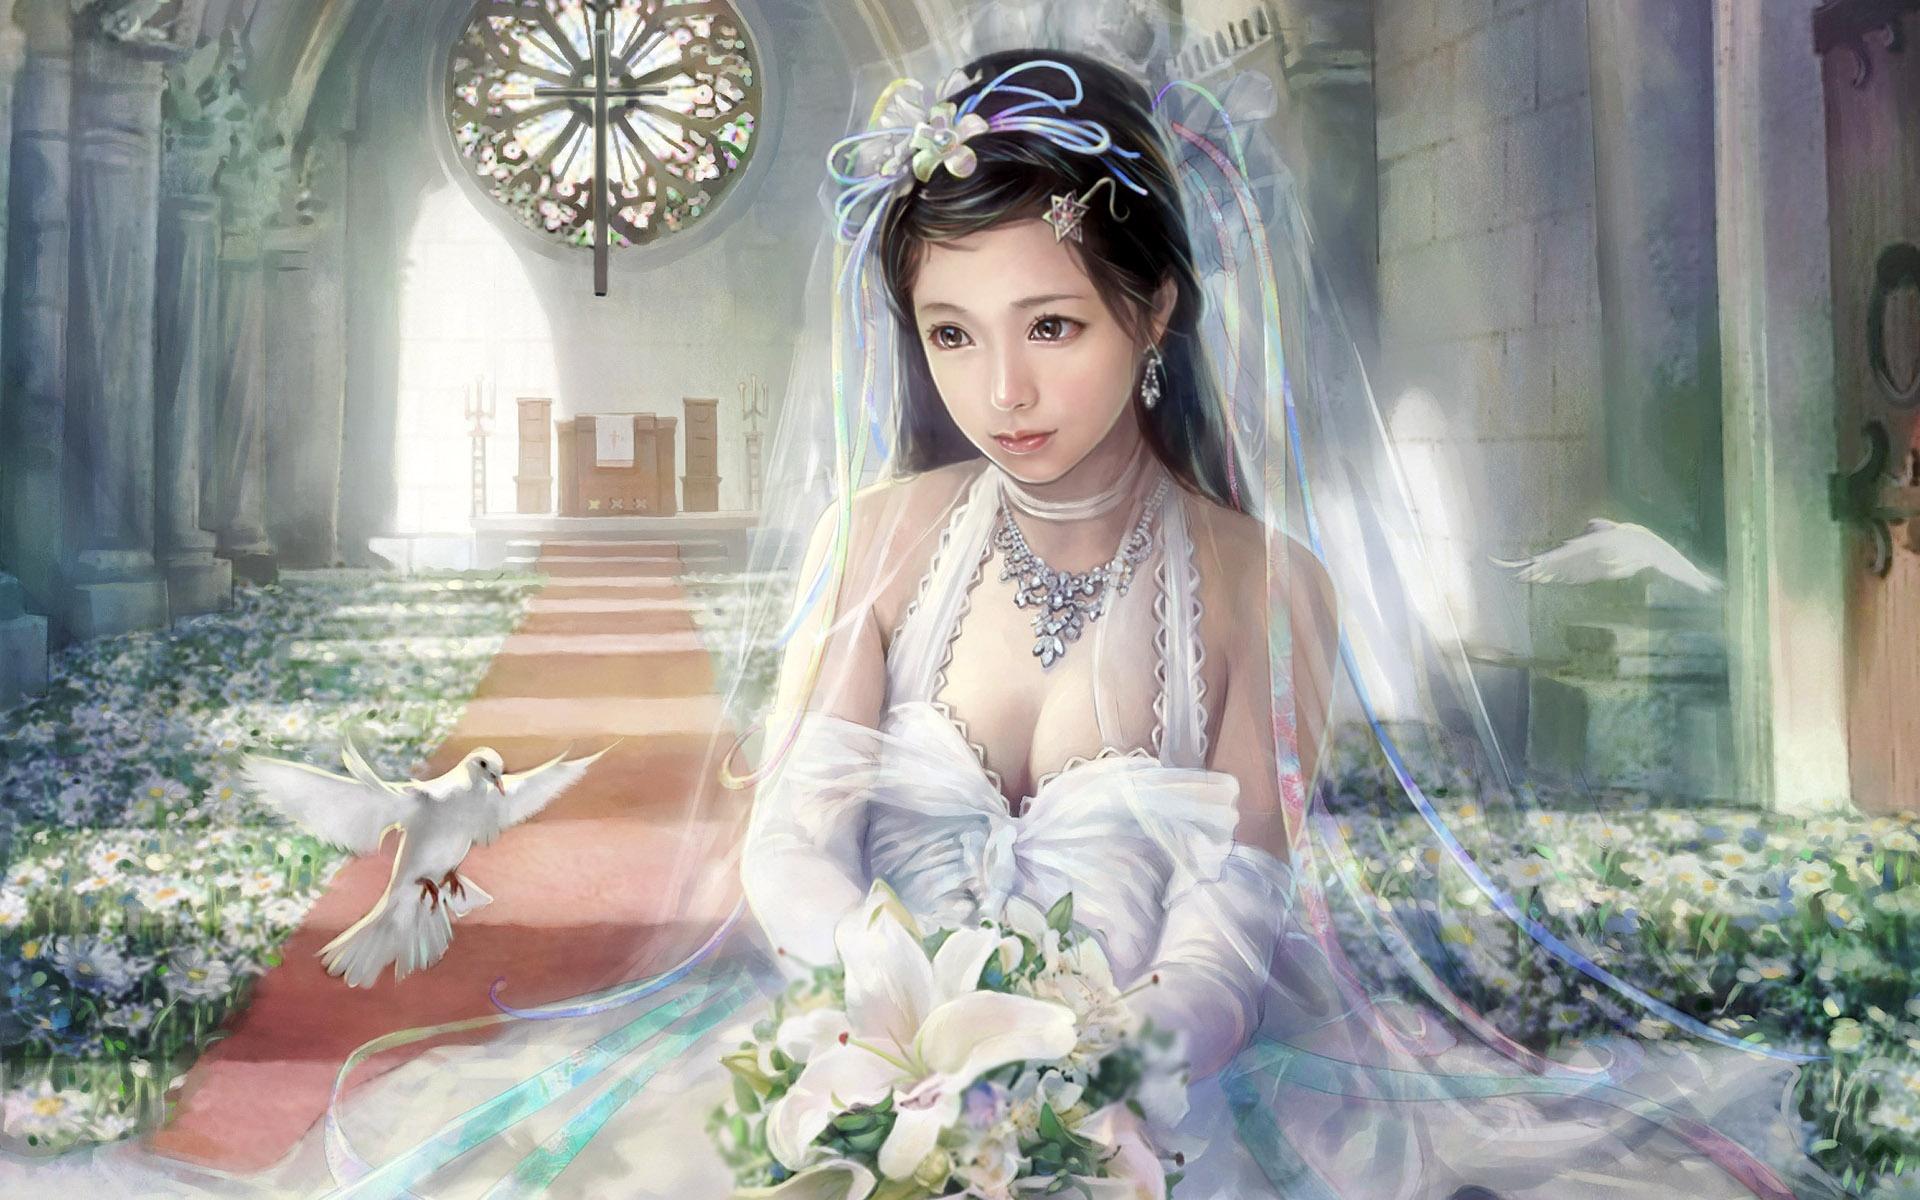 Wallpaper Beautiful white wedding dress fantasy girl 1920x1200 HD ...